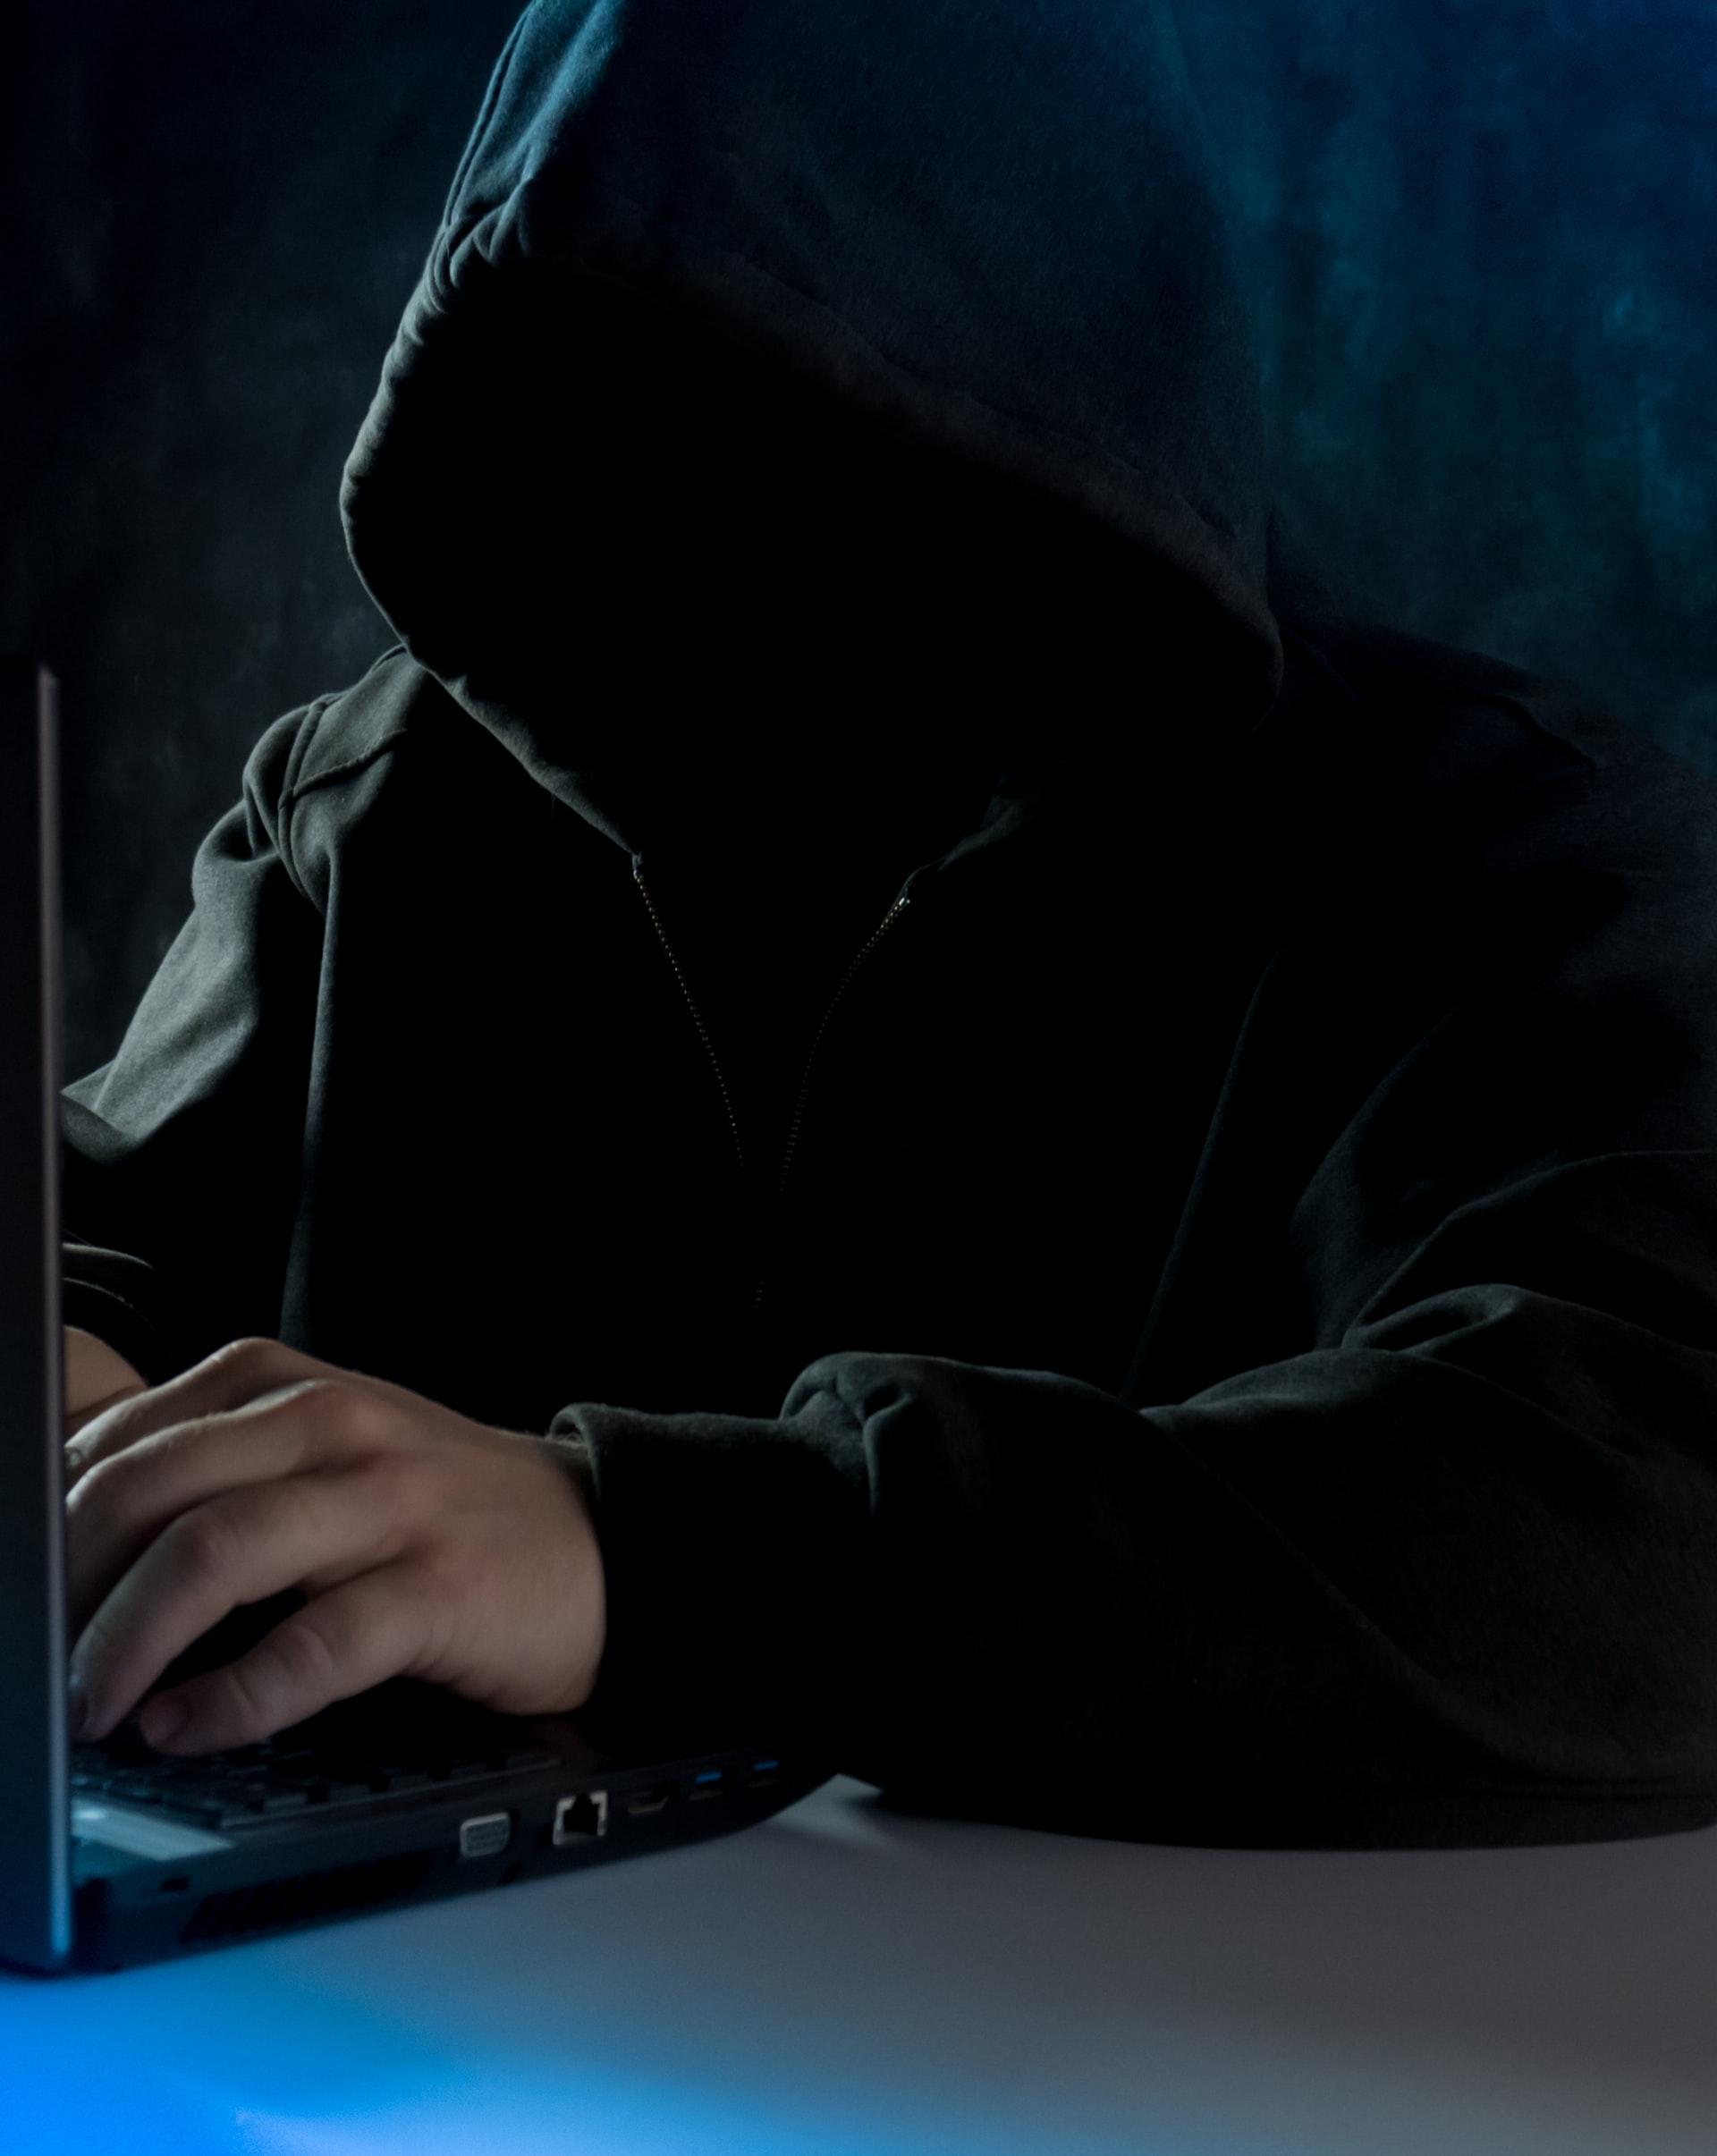 anonymous computer hacker in hoodie using laptop